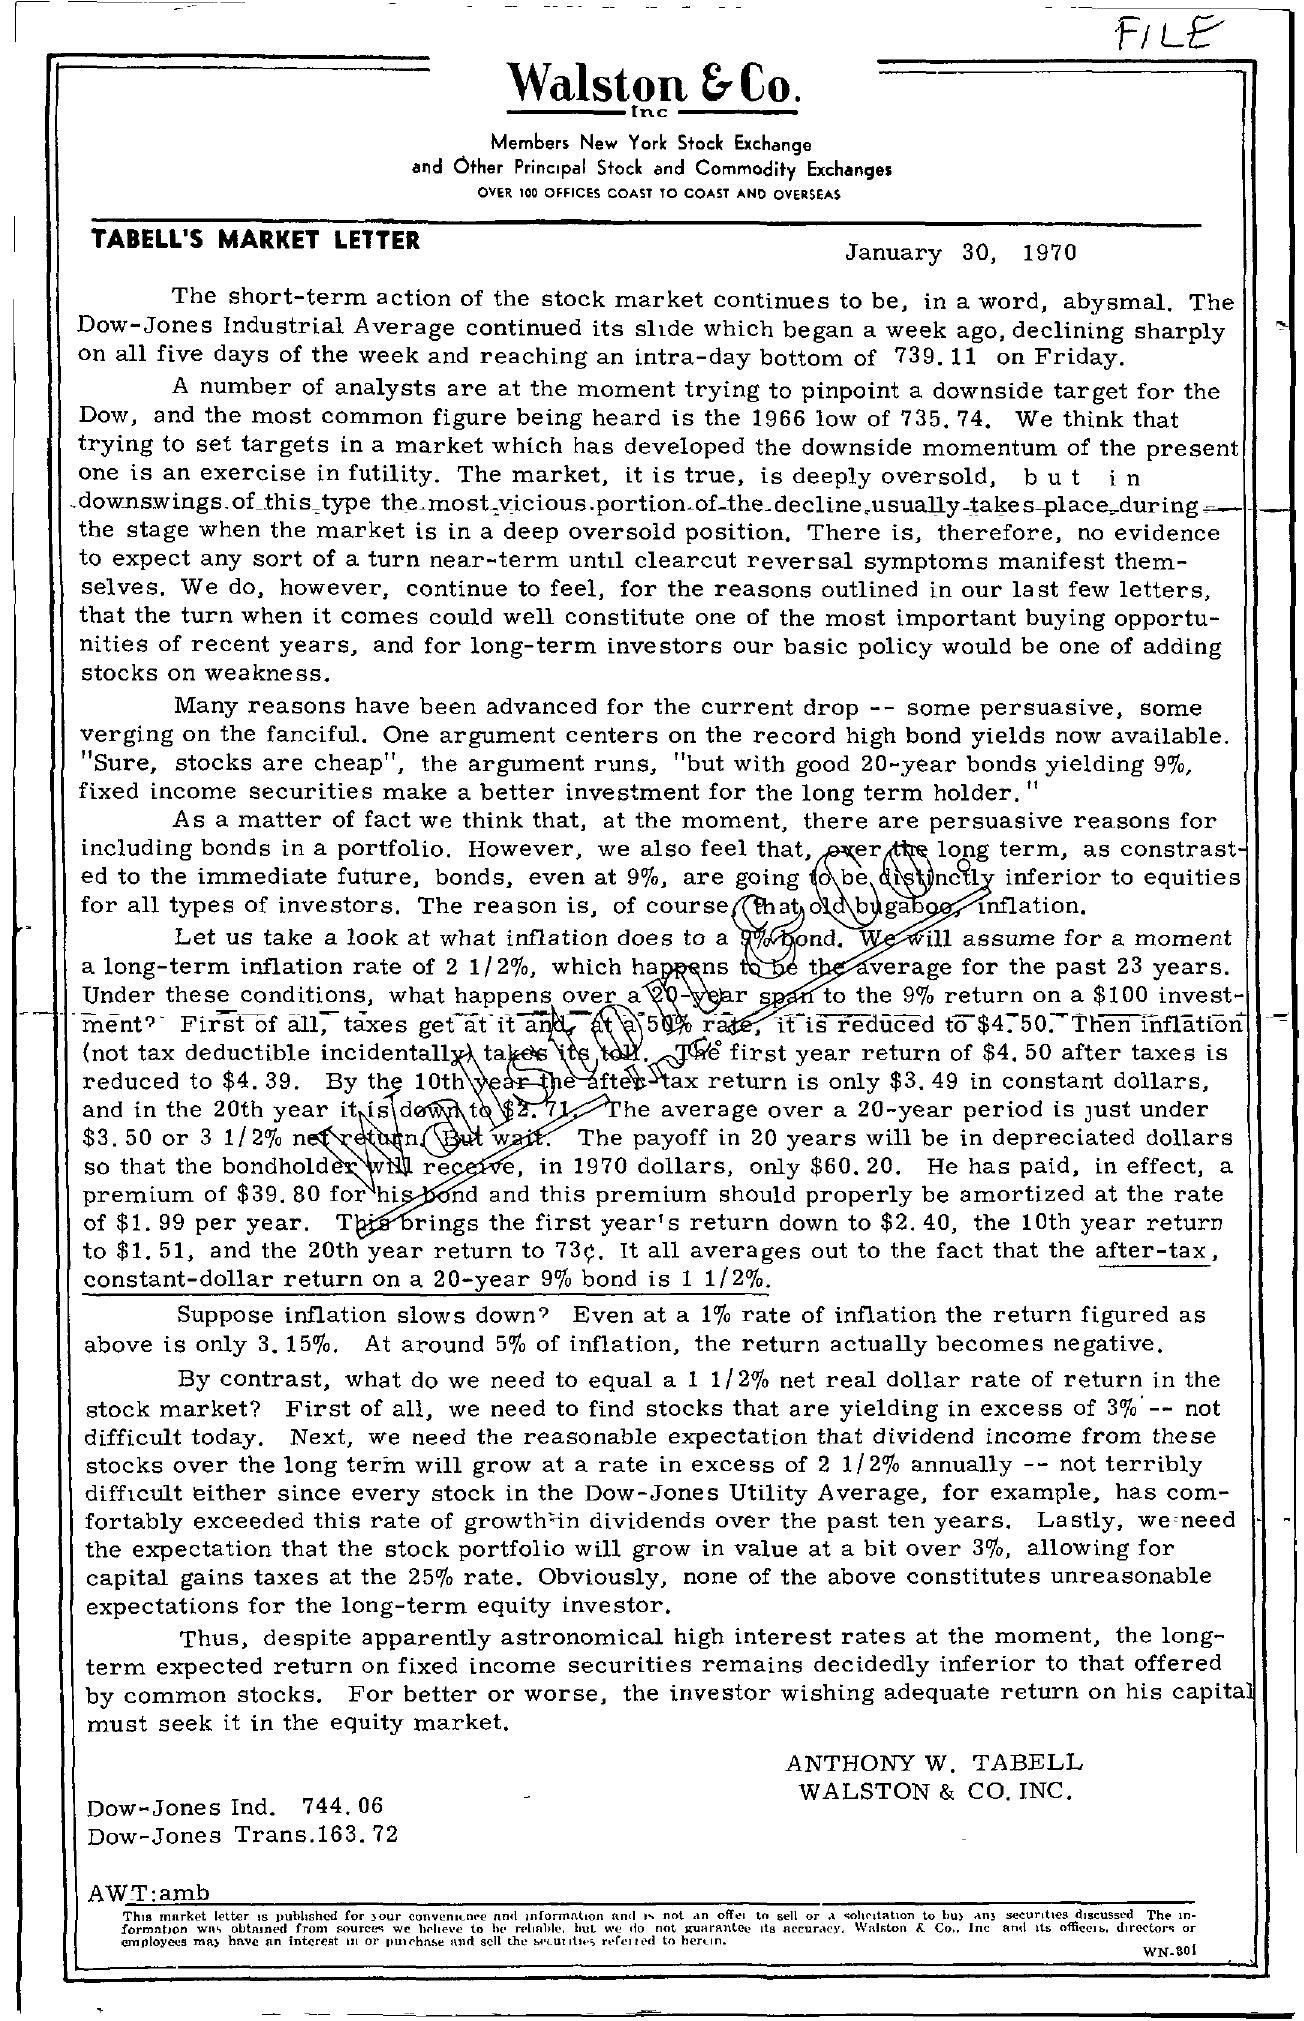 Tabell's Market Letter - January 30, 1970